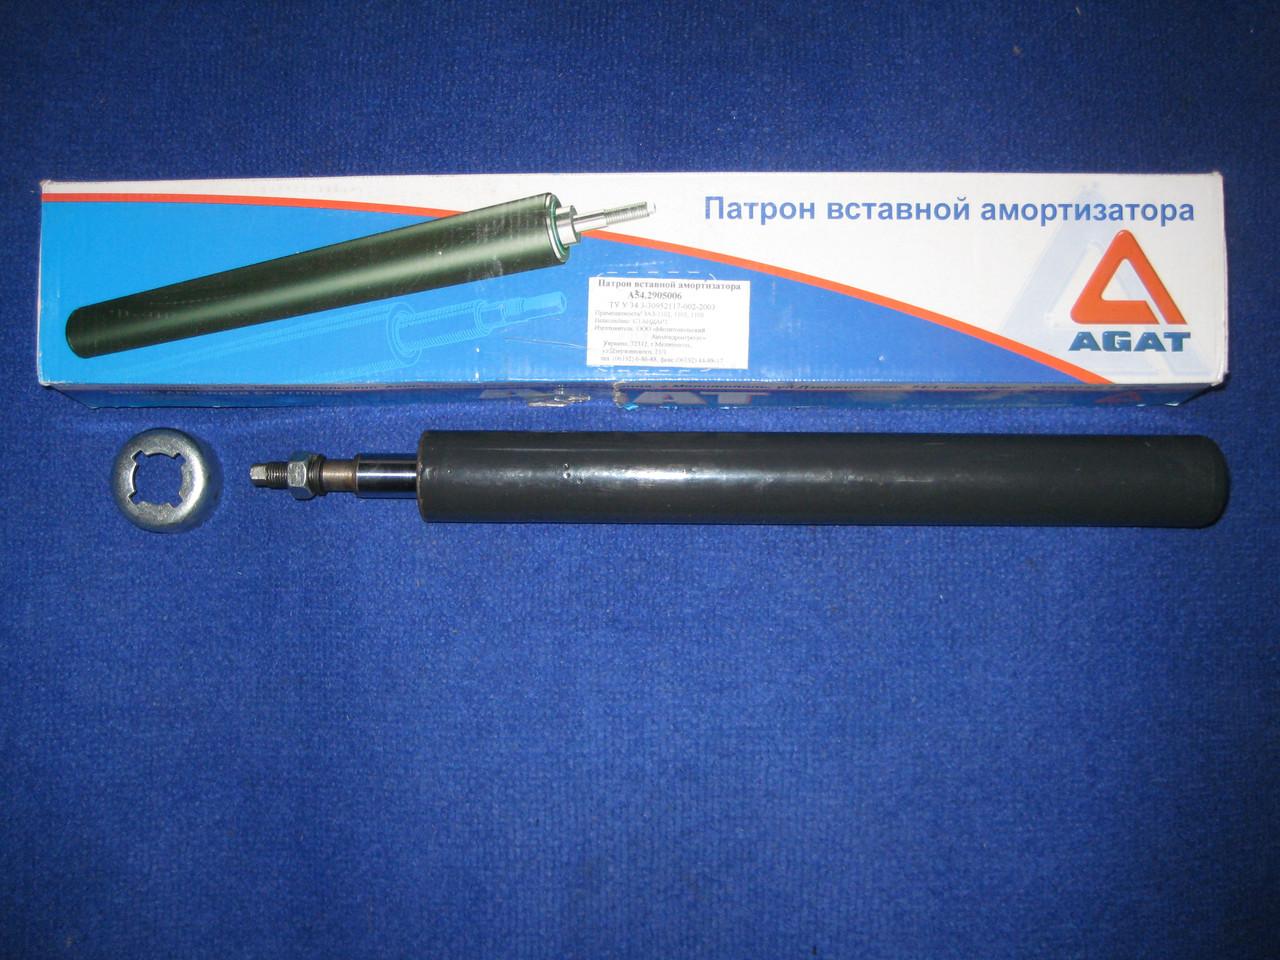 Амортизатор передний масляный вставка Таврия Славута ЗАЗ 1102 1103 1105 А54.2905006 Агат